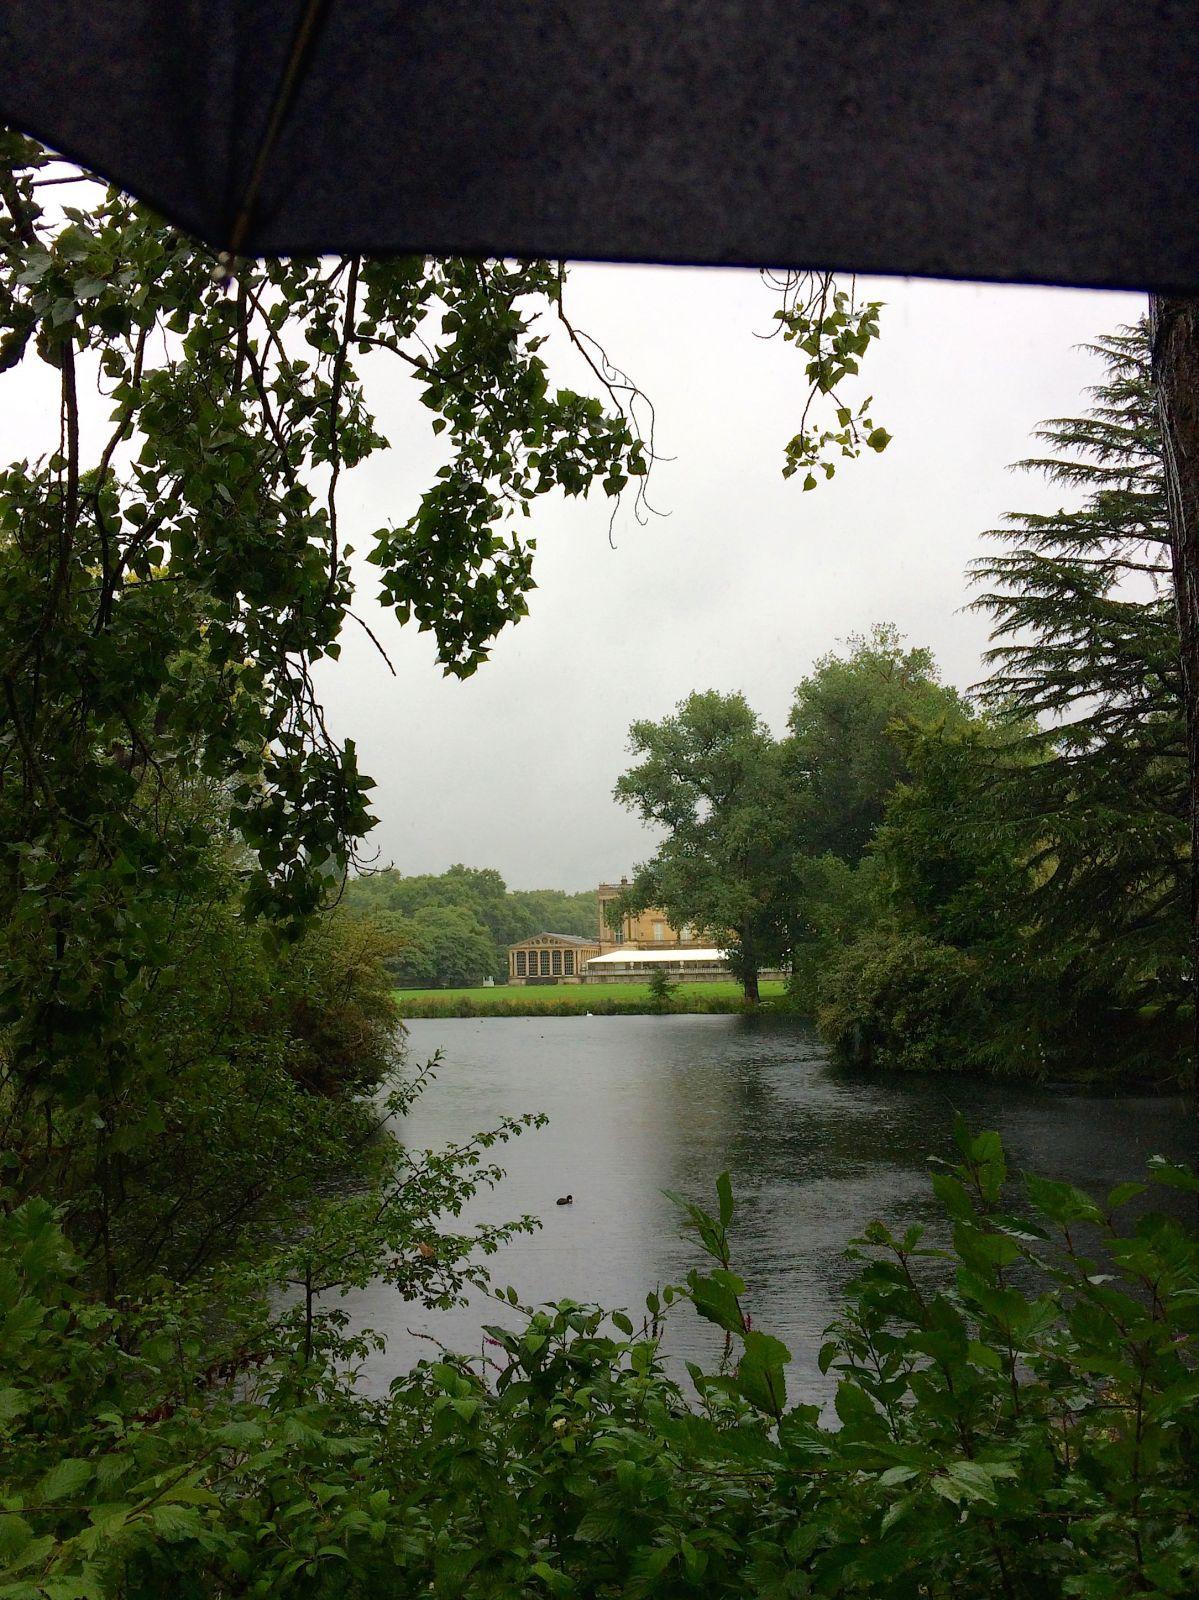 buckingham-palace-rear-view